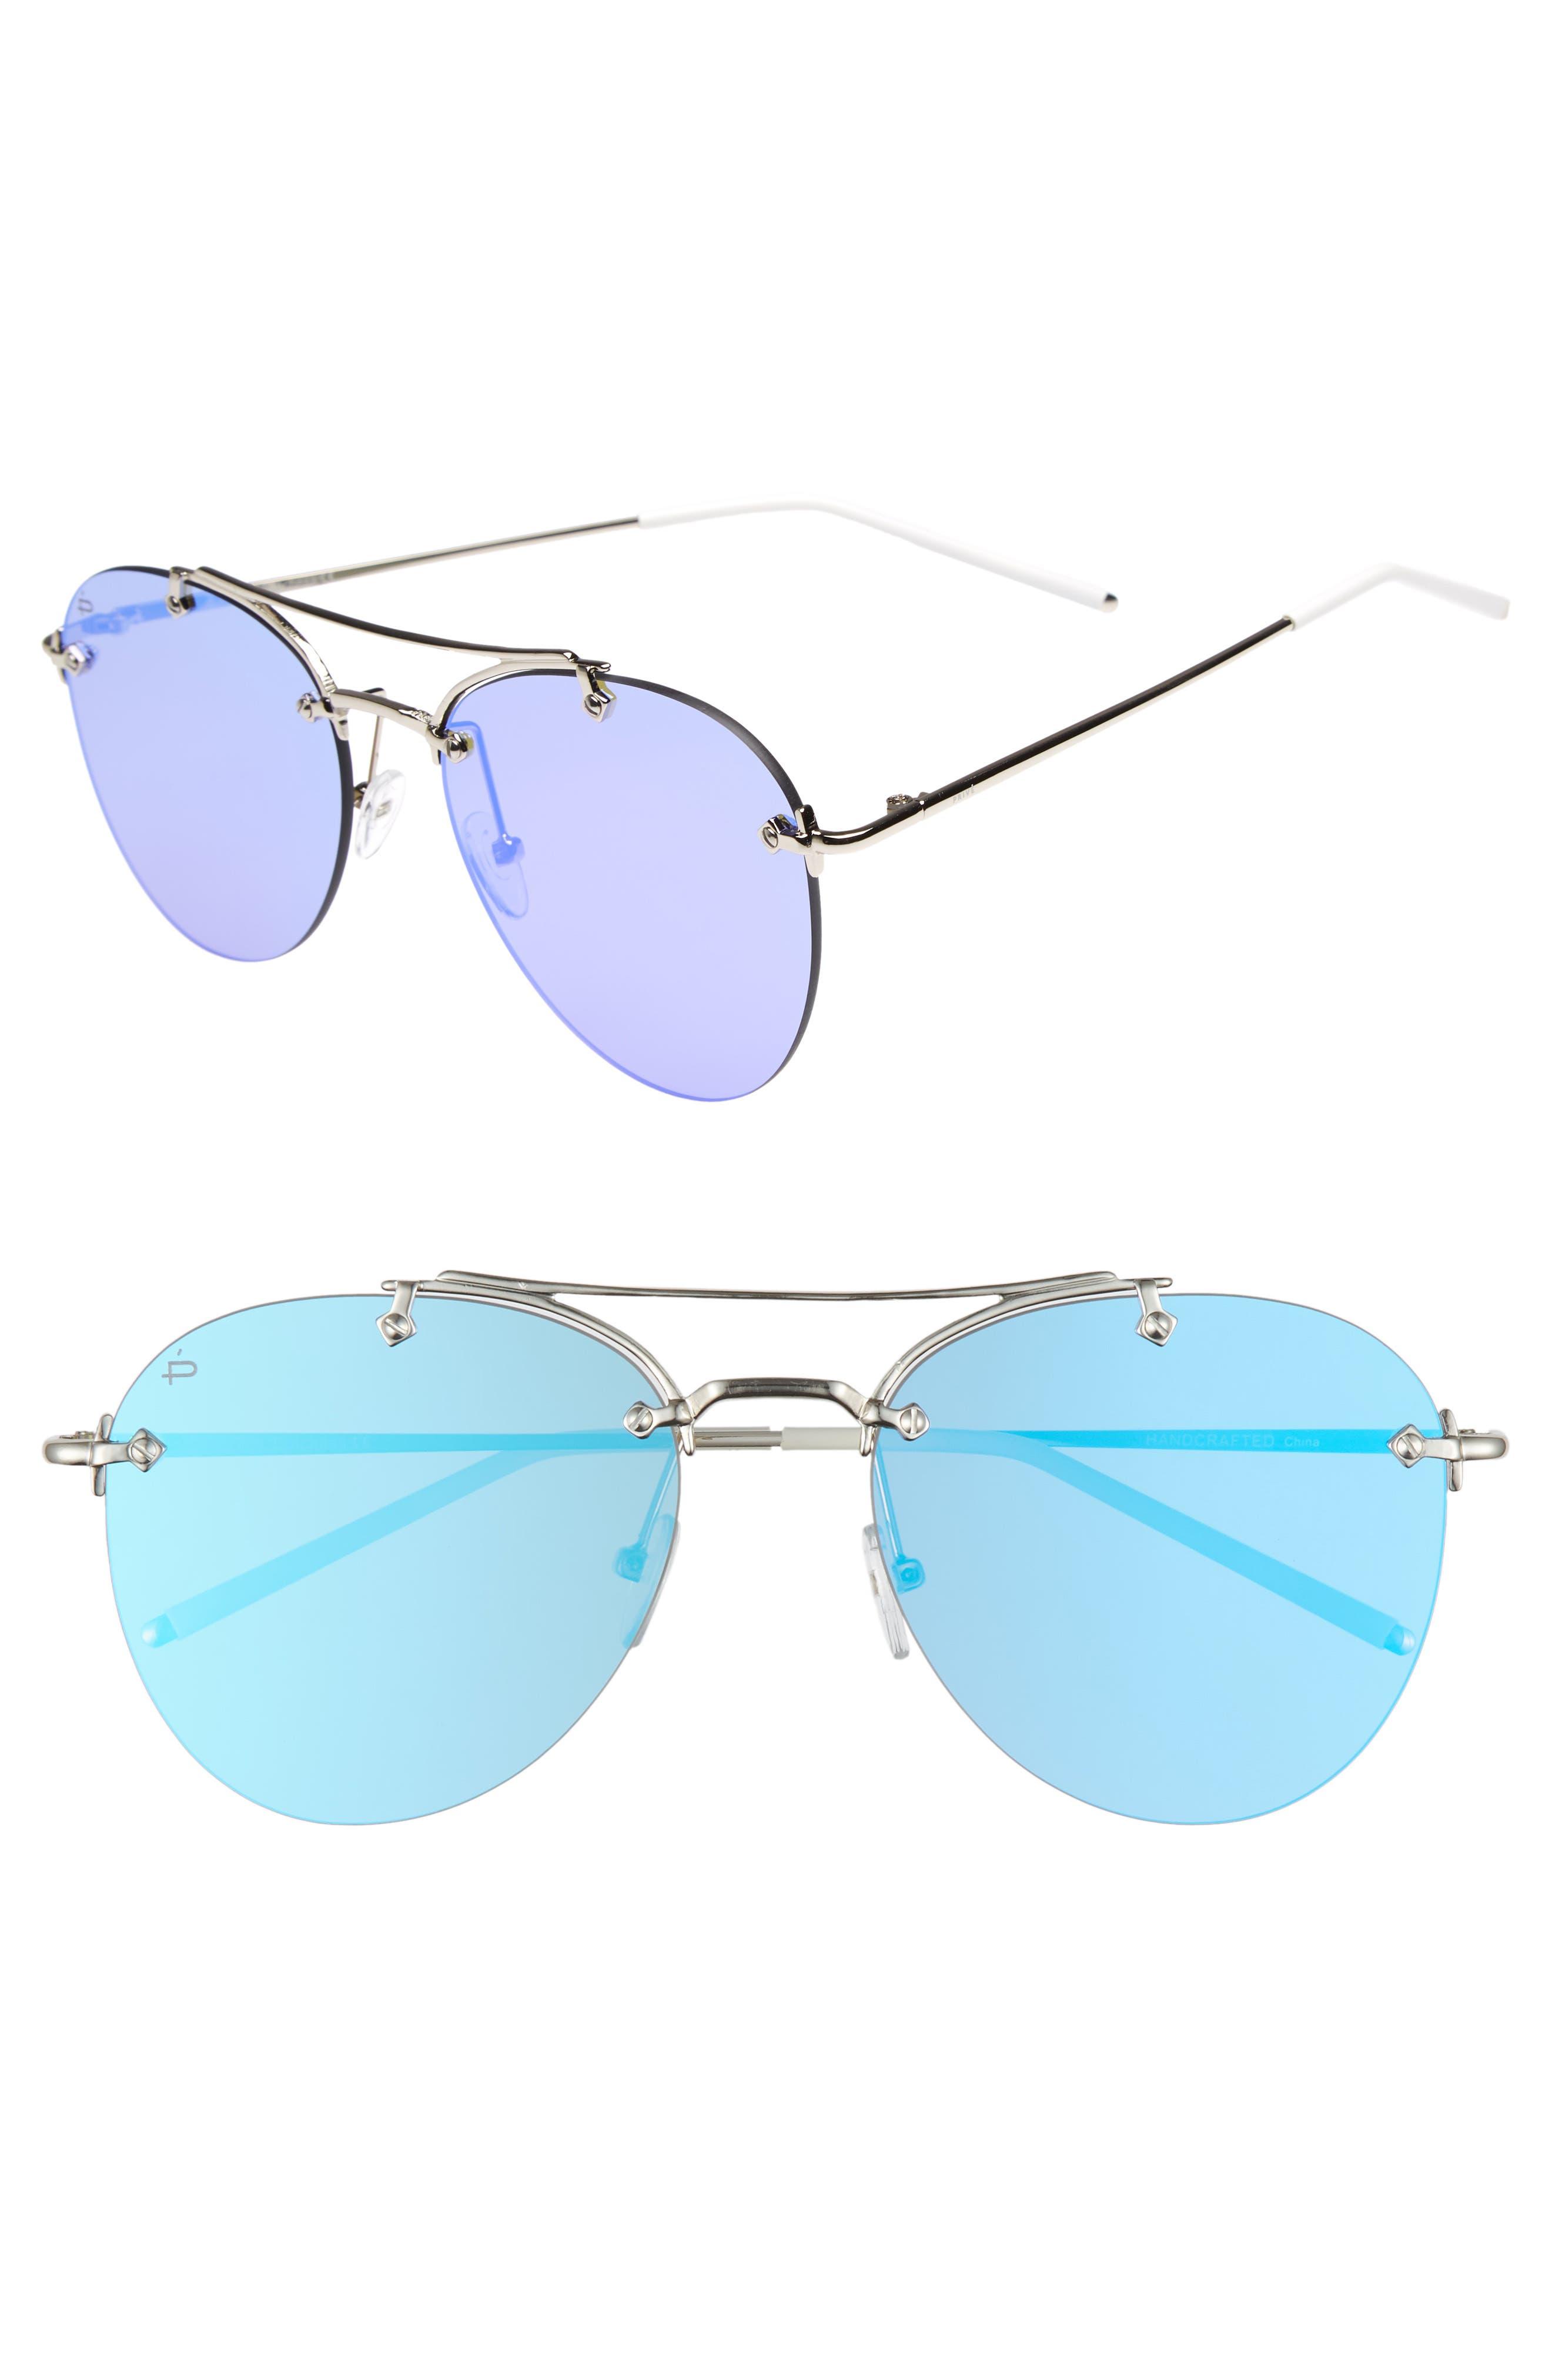 Privé Revaux The Dutchess 57mm Aviator Sunglasses,                         Main,                         color, 040